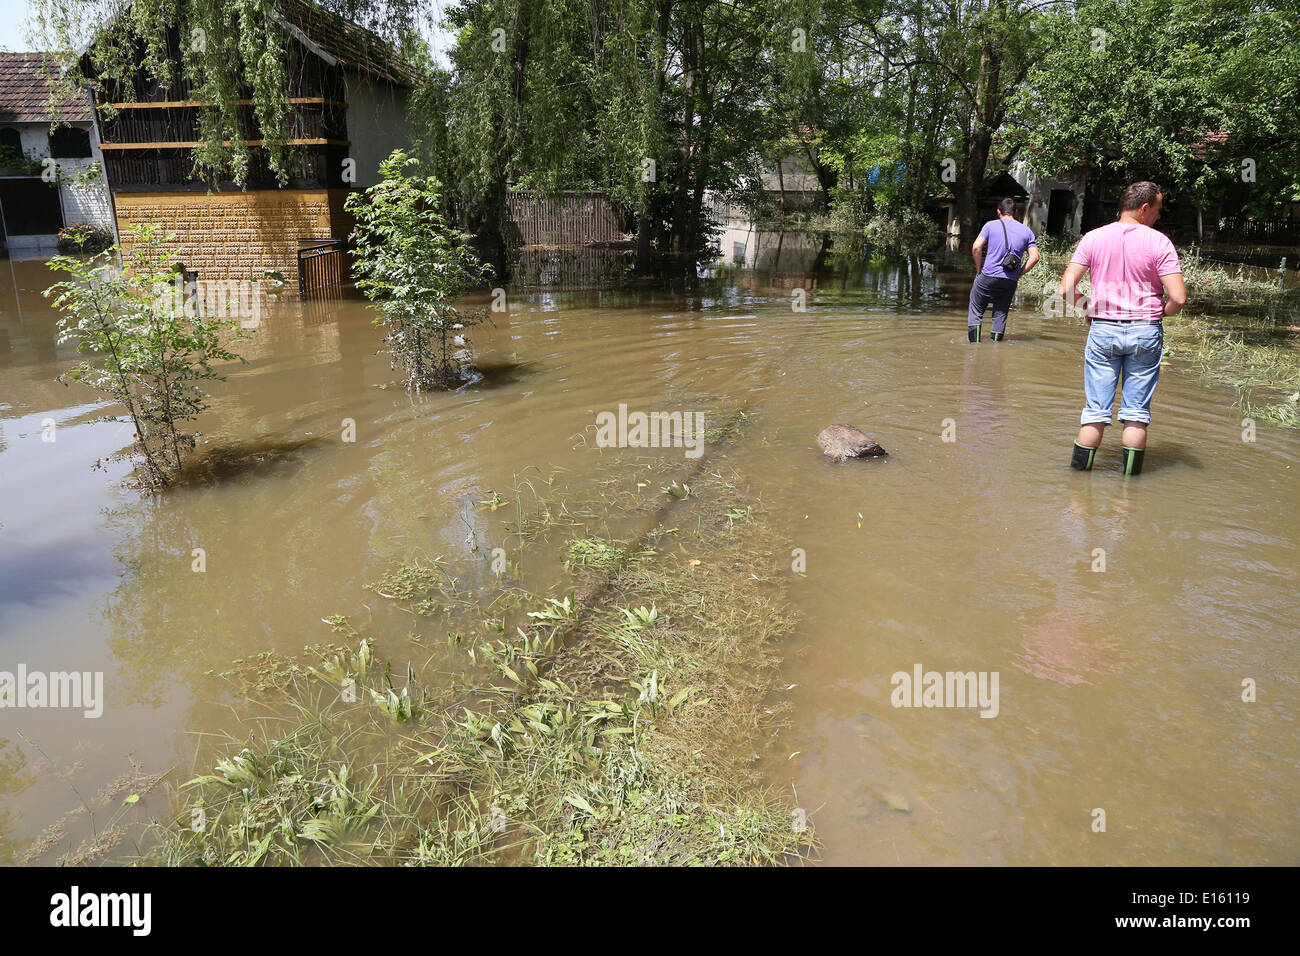 (140523) -- ODZAK (BOSNIA AND HERZEGOVINA), May 23, 2014 (Xinhua) -- People walk in water near Odzak, Bosnia and Herzegovina, on May 23, 2014. The worst flooding in 120 years hit Bosnia and Herzegovina last week. (Xinhua/Haris Memija) - Stock Image